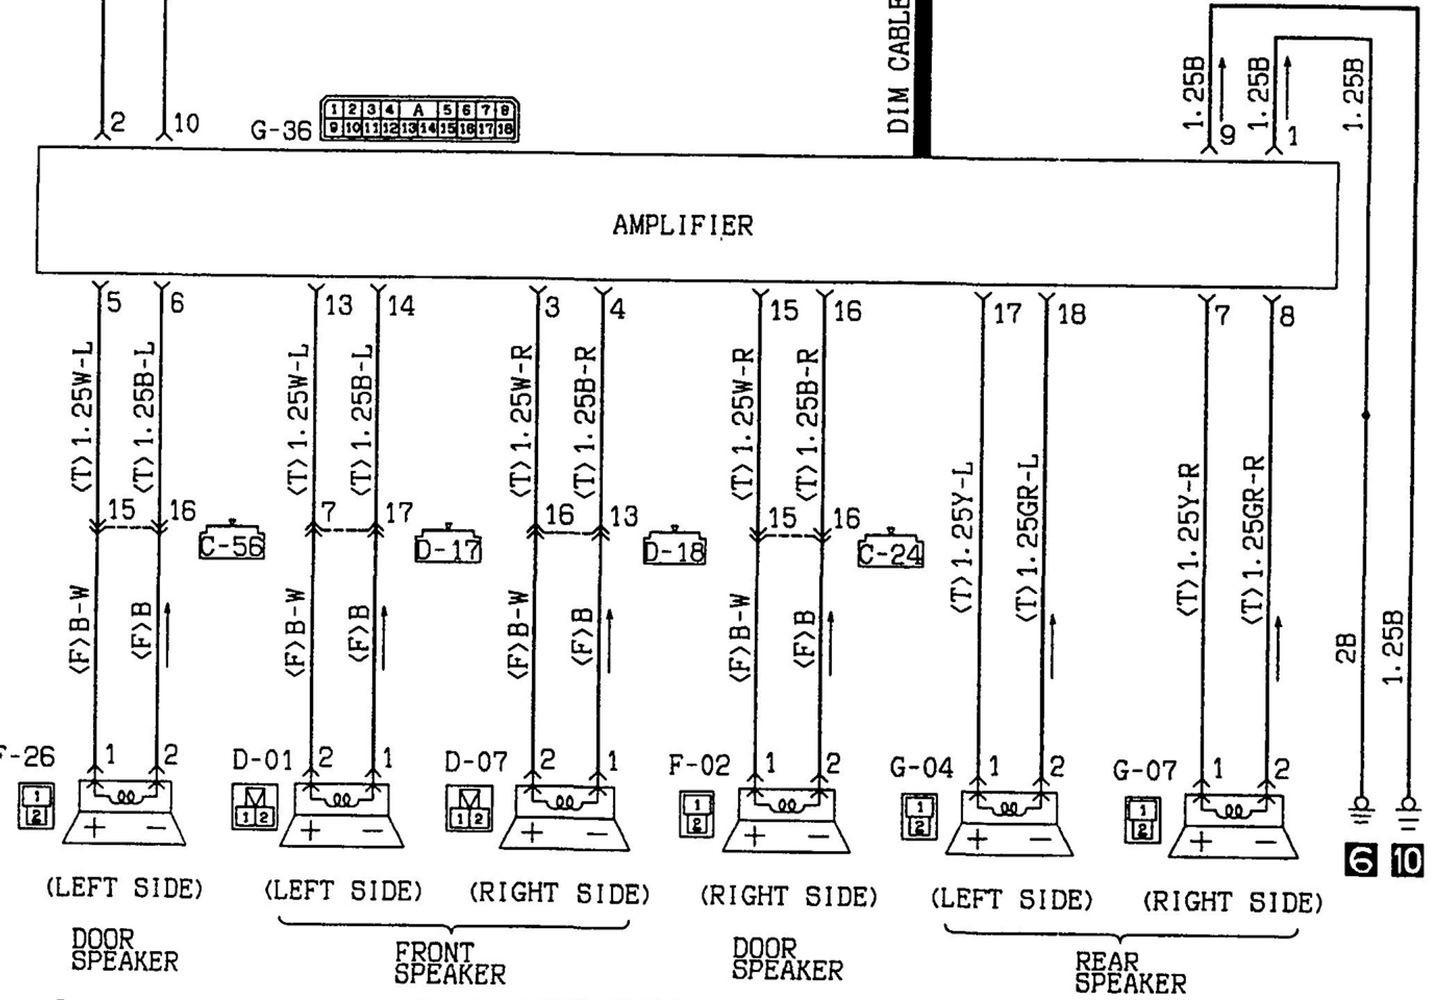 mitsubishi galant stereo wiring diagram Collection-1995 mitsubishi eclipse radio wiring diagram wiring rh westpol co 1997 Mitsubishi Diamante Parts 1996 Mitsubishi Diamante 2-f